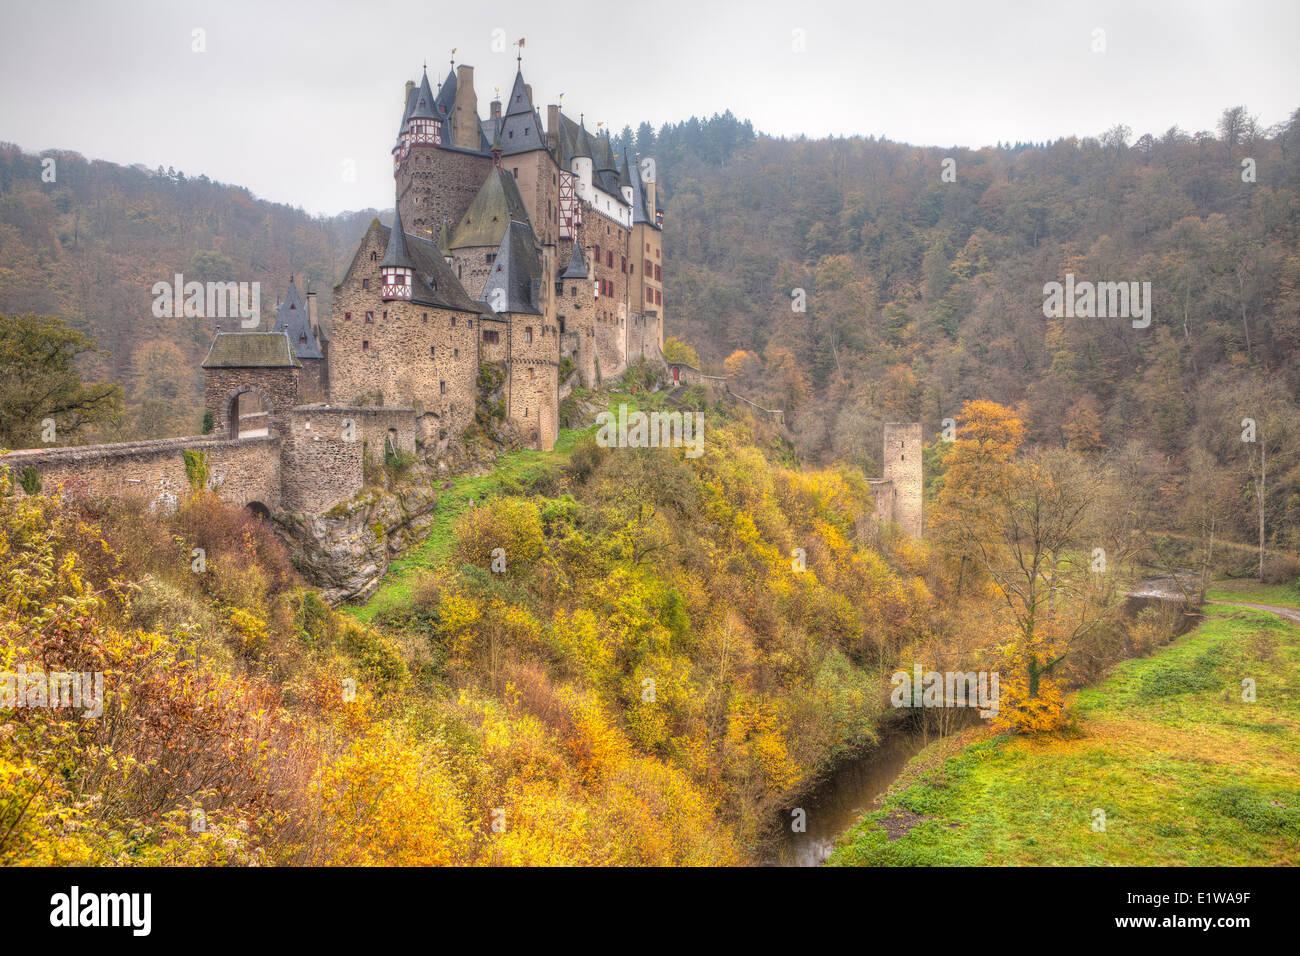 Eltz Castle in Autumn, Rhineland-Pfalz, Germany Stock Photo